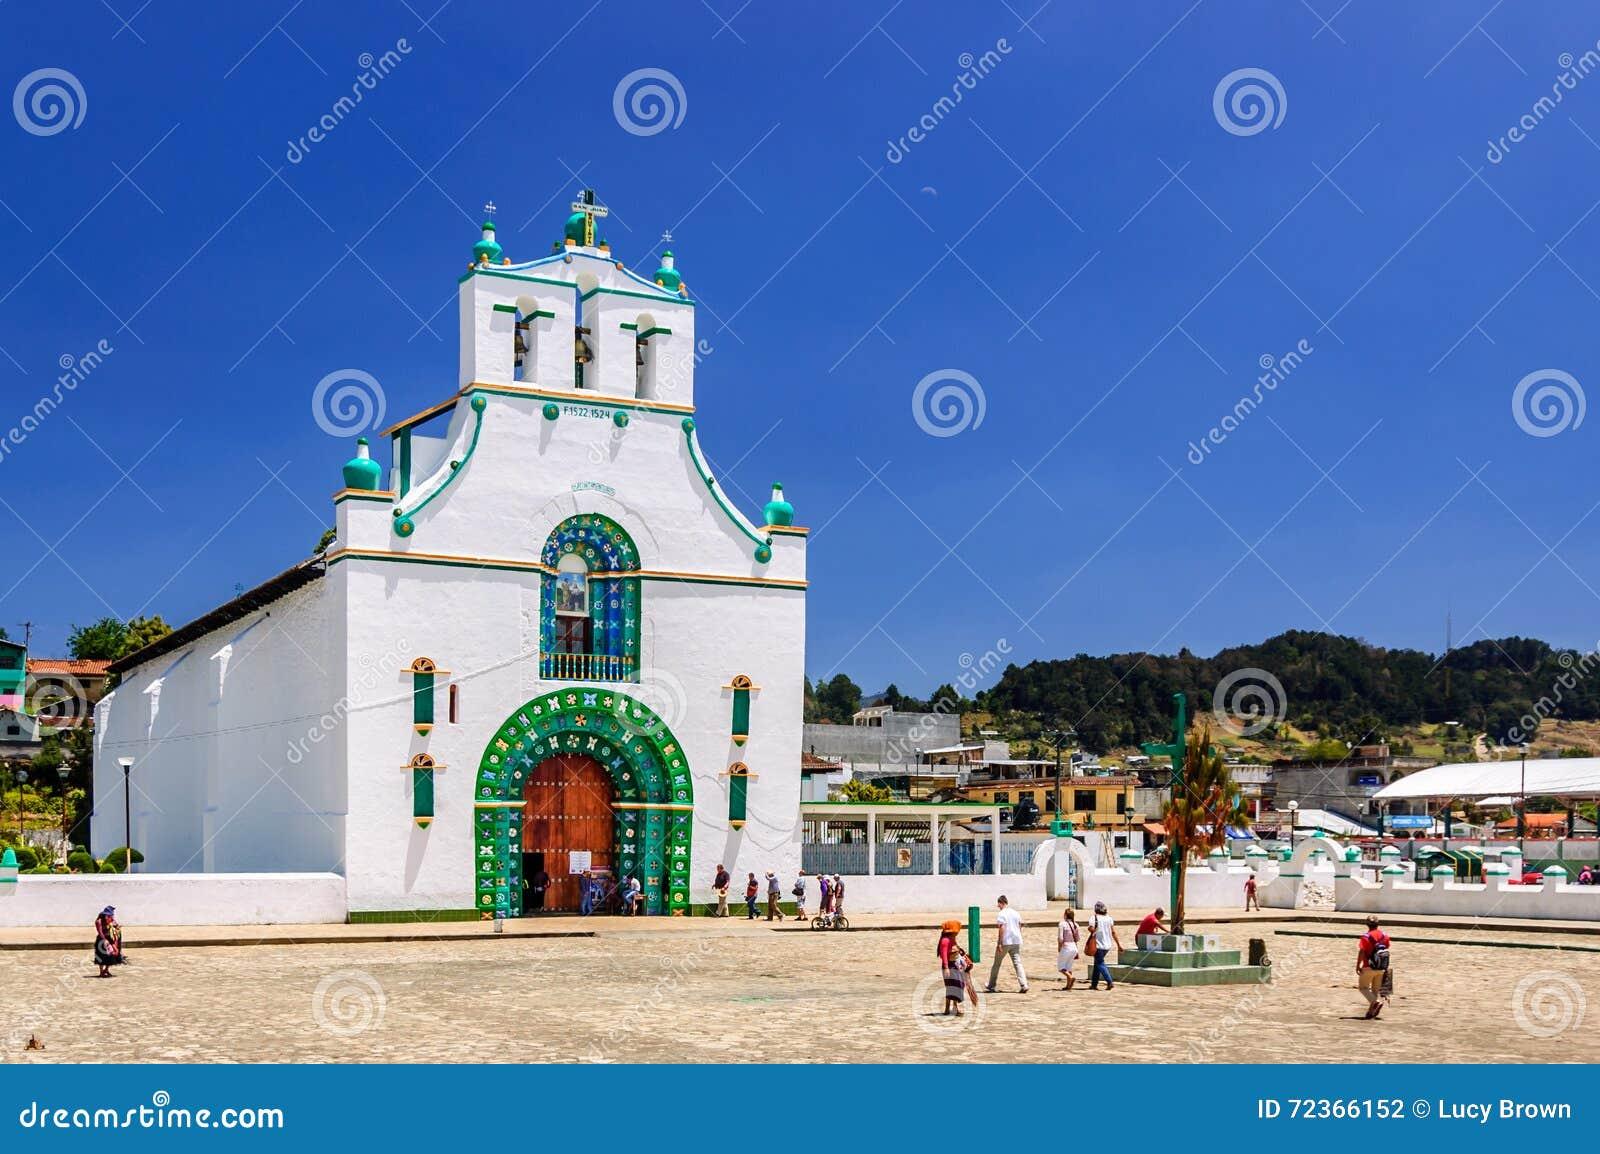 Ornate church, Chamula, Mexico